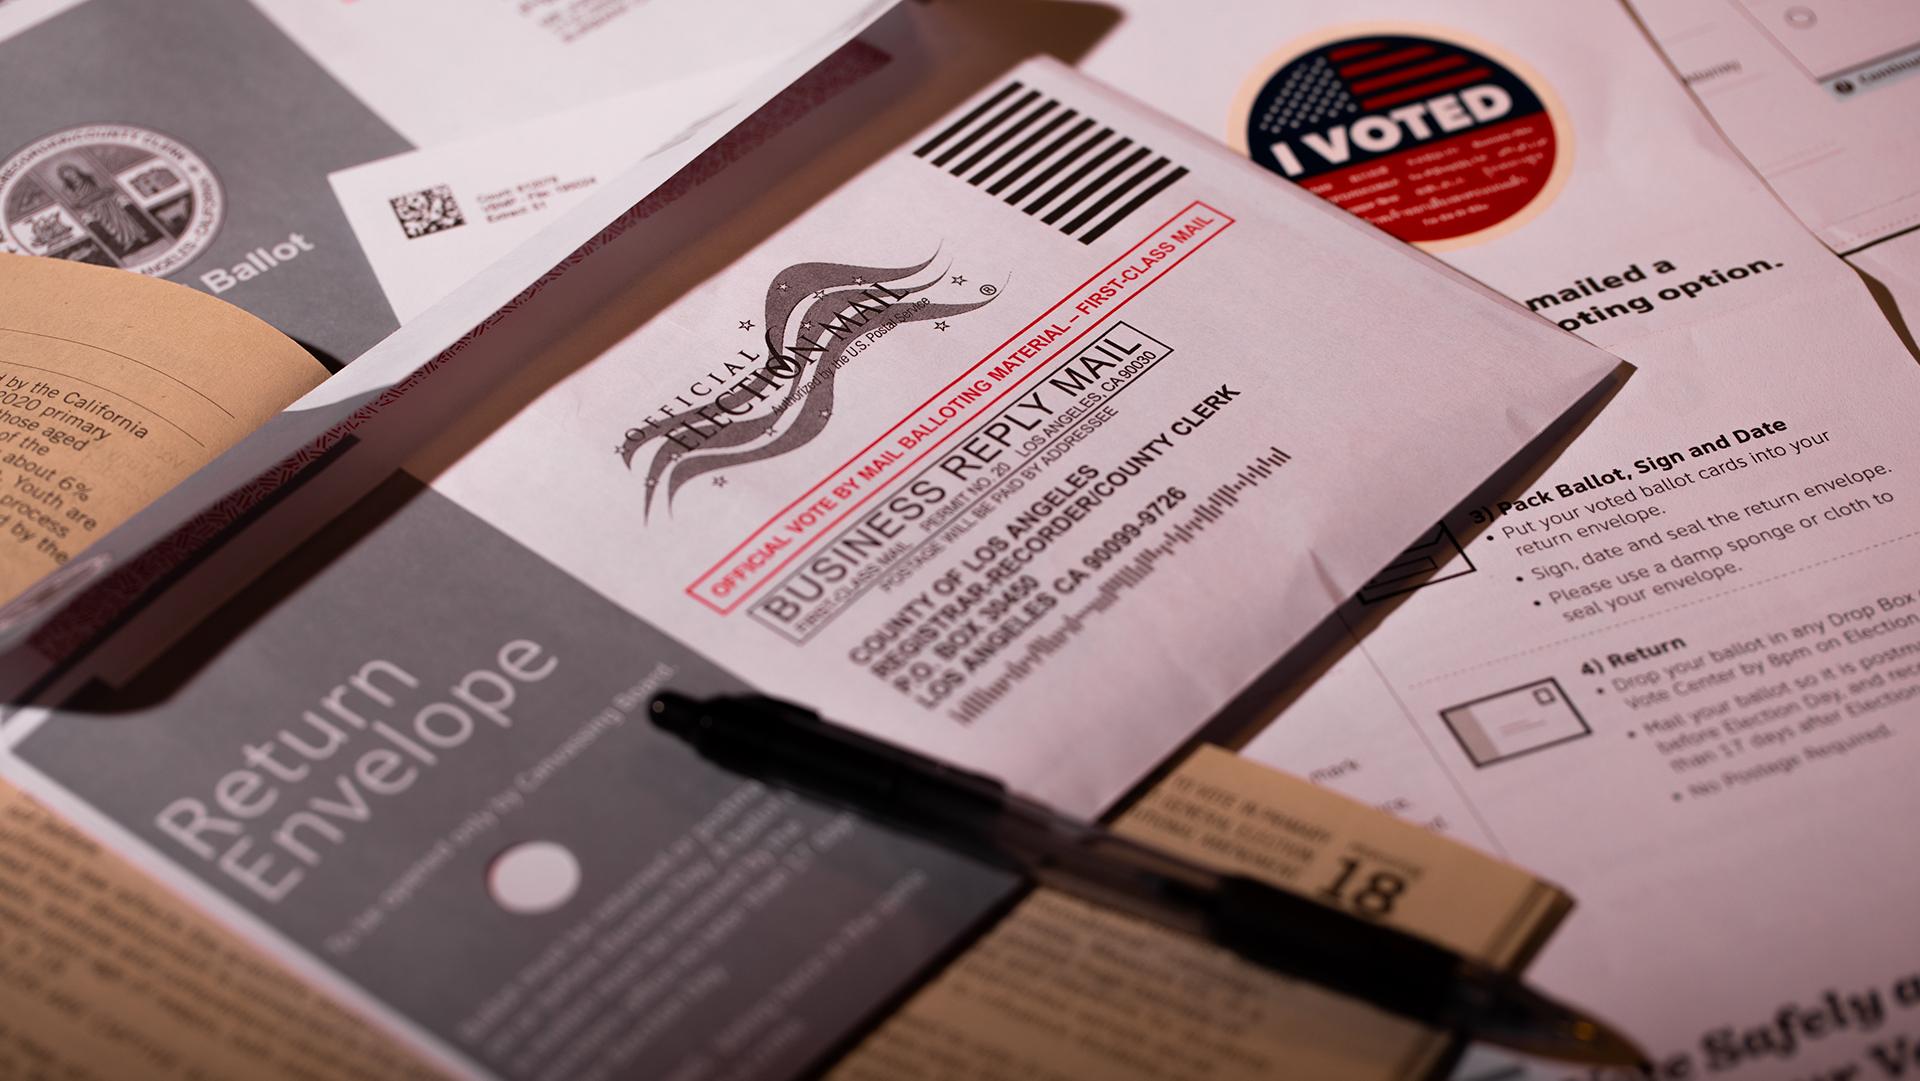 Los Angeles California, October 8, 2020: Voting ballot material. | Jorge Villalba / iStock